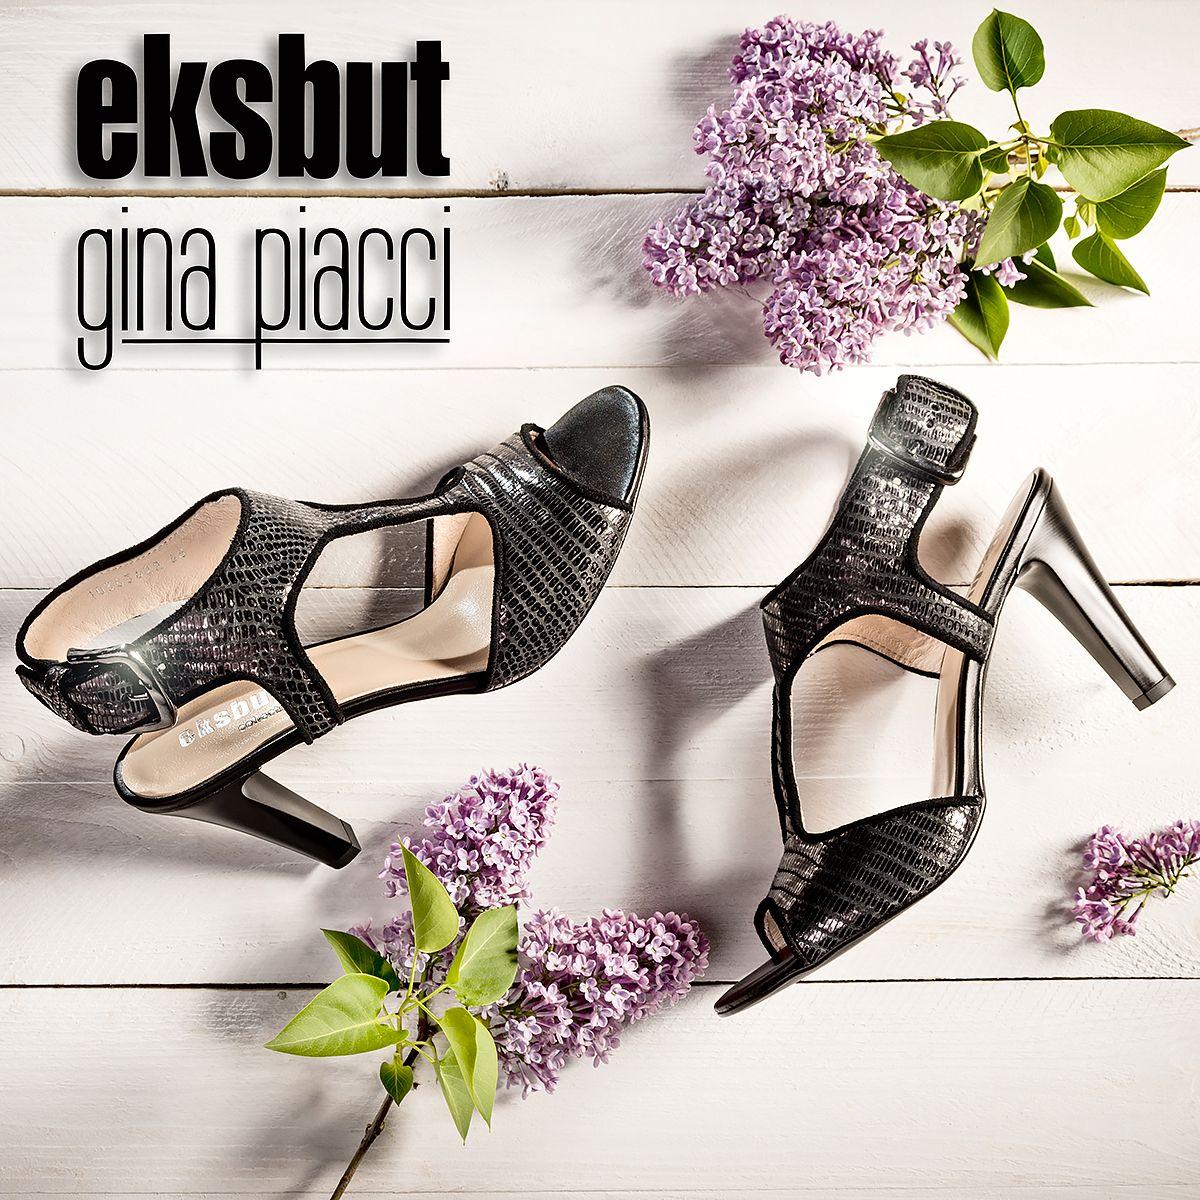 Letnia Nutka Romantyzmu Eksbut Gina Piacci Ginapiacci Shoes Shoe Buty Romantic Summer Lato Romantyczny Time Vacation Waka Shoes Heels Sandals